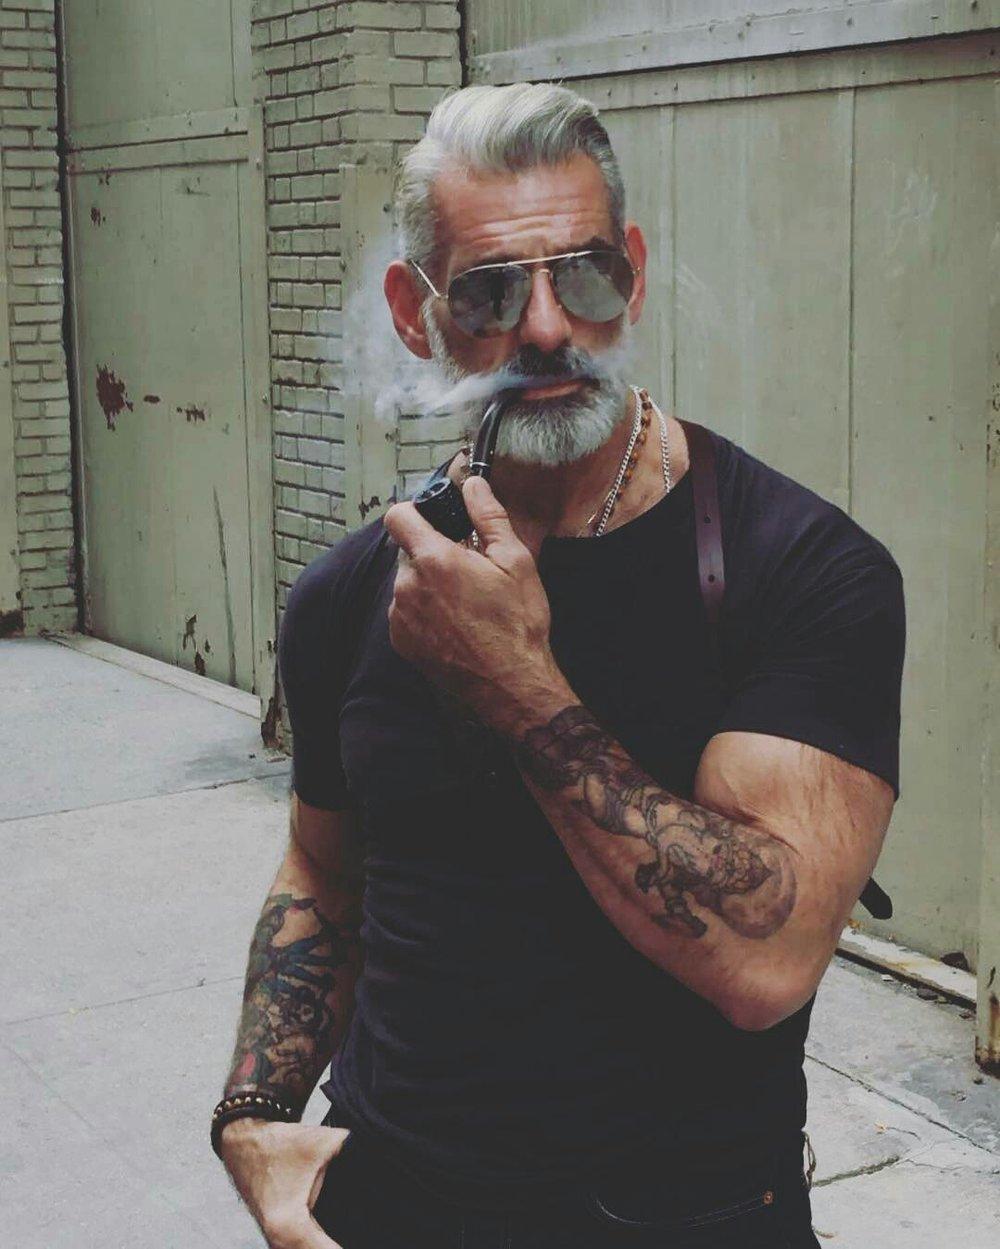 борода стиль